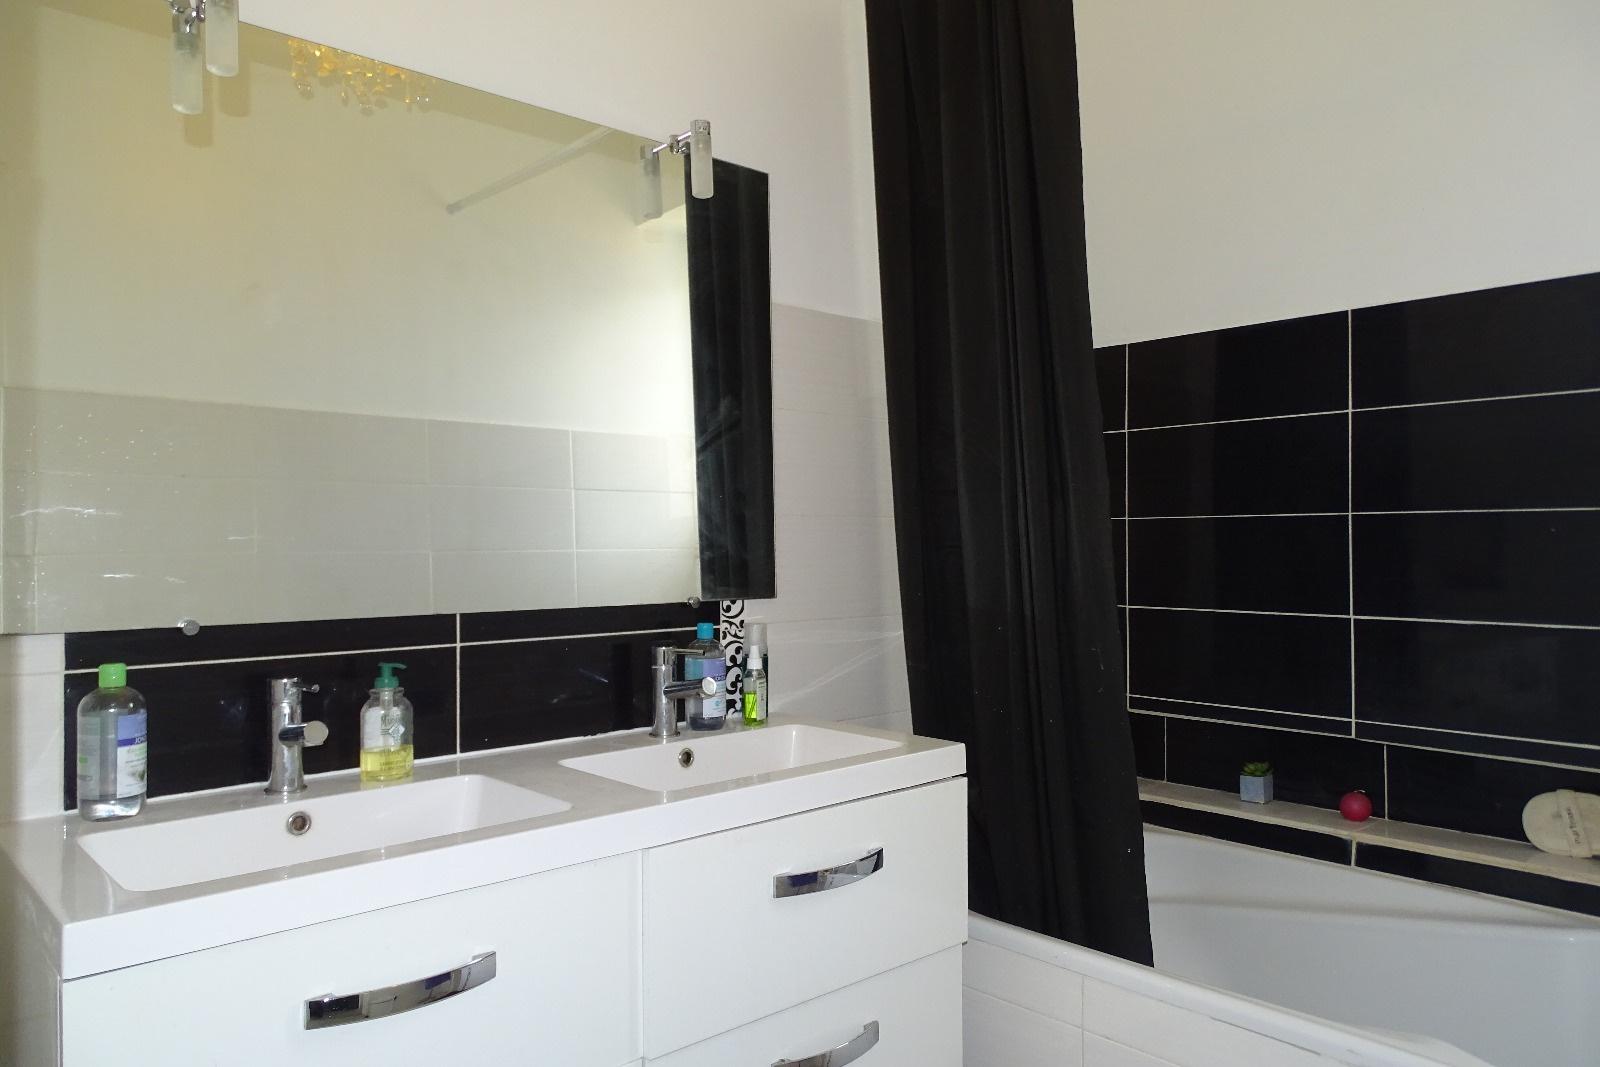 vente a vendre n mes maison 4 chambres jardin. Black Bedroom Furniture Sets. Home Design Ideas